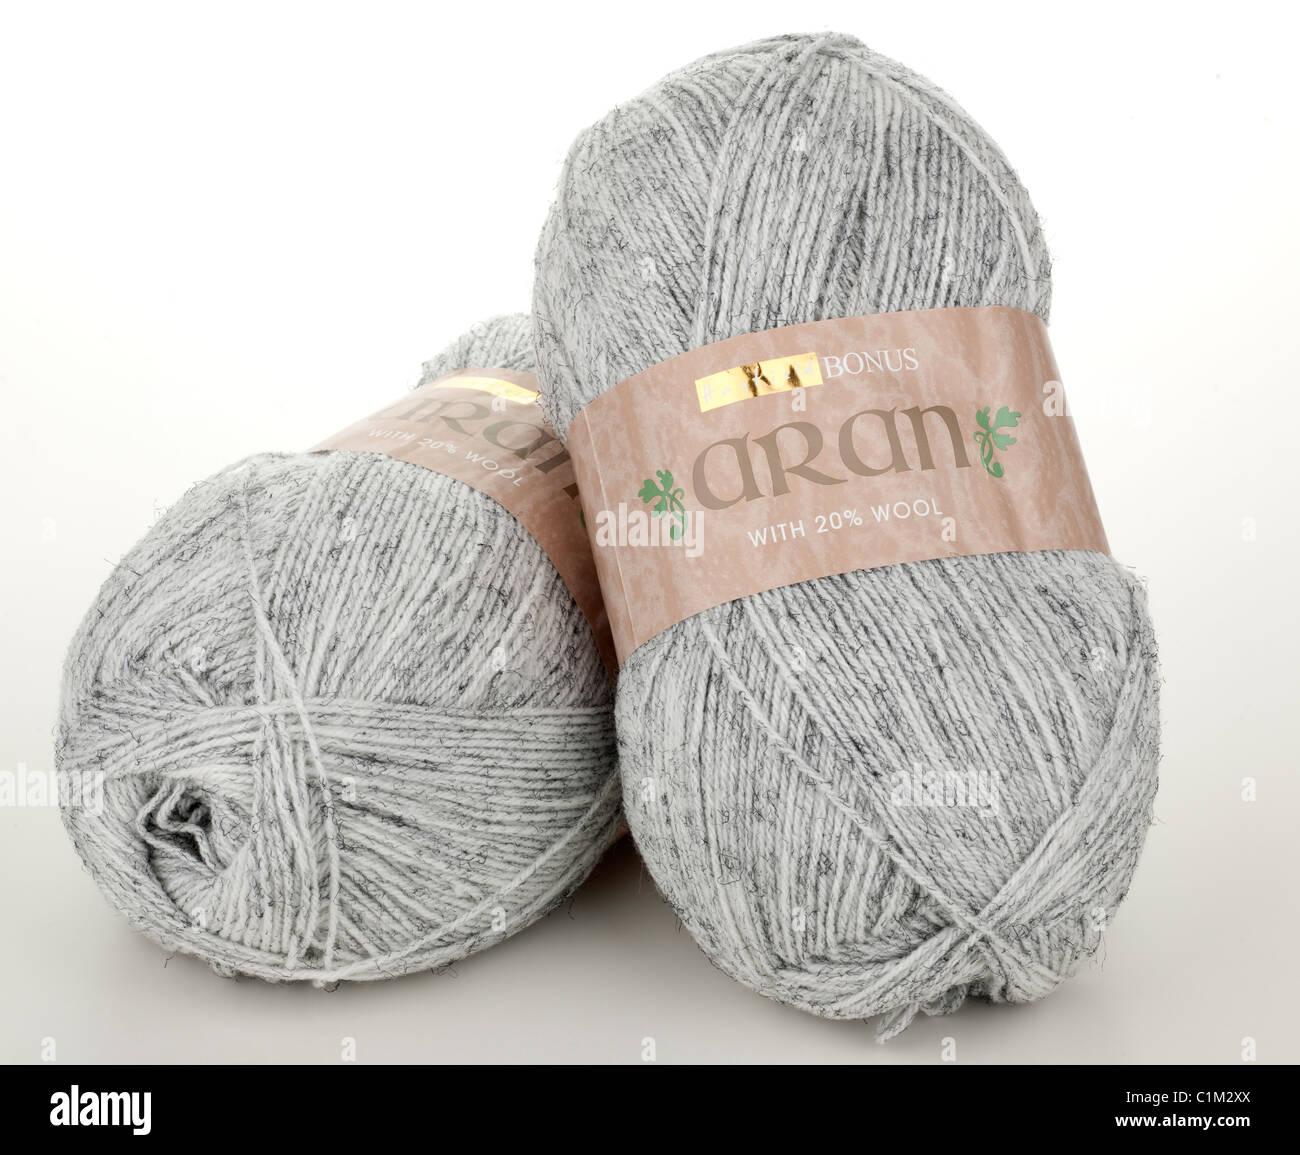 Aran Knitting Imágenes De Stock & Aran Knitting Fotos De Stock - Alamy